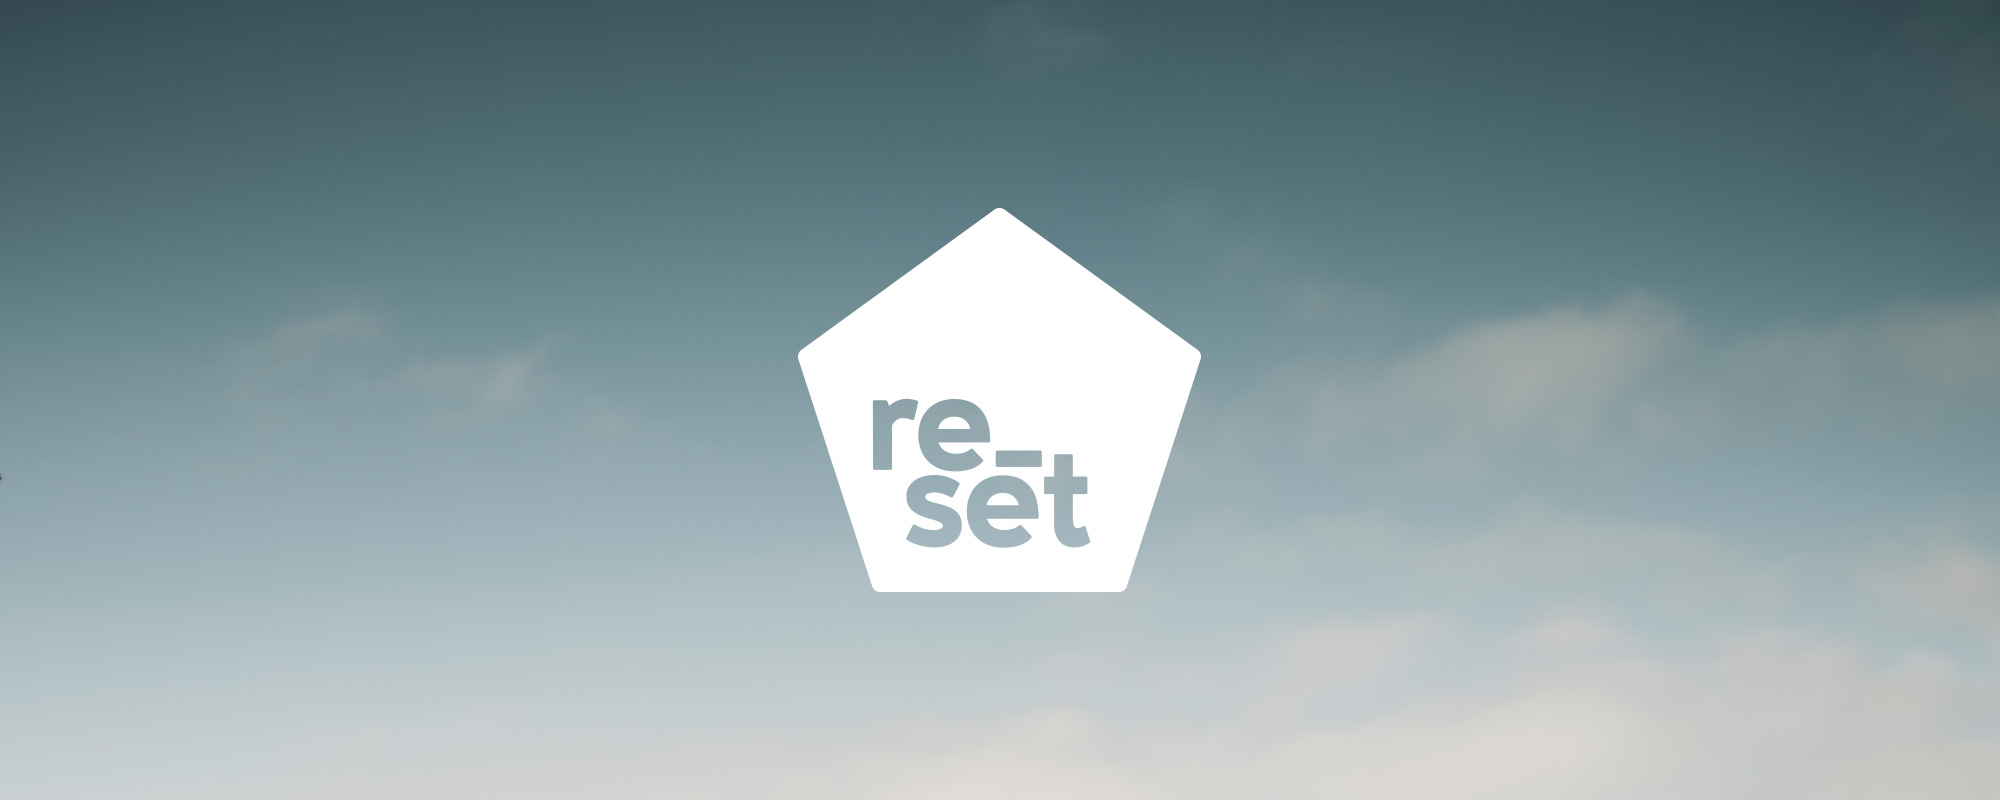 Re_set_logo.jpg